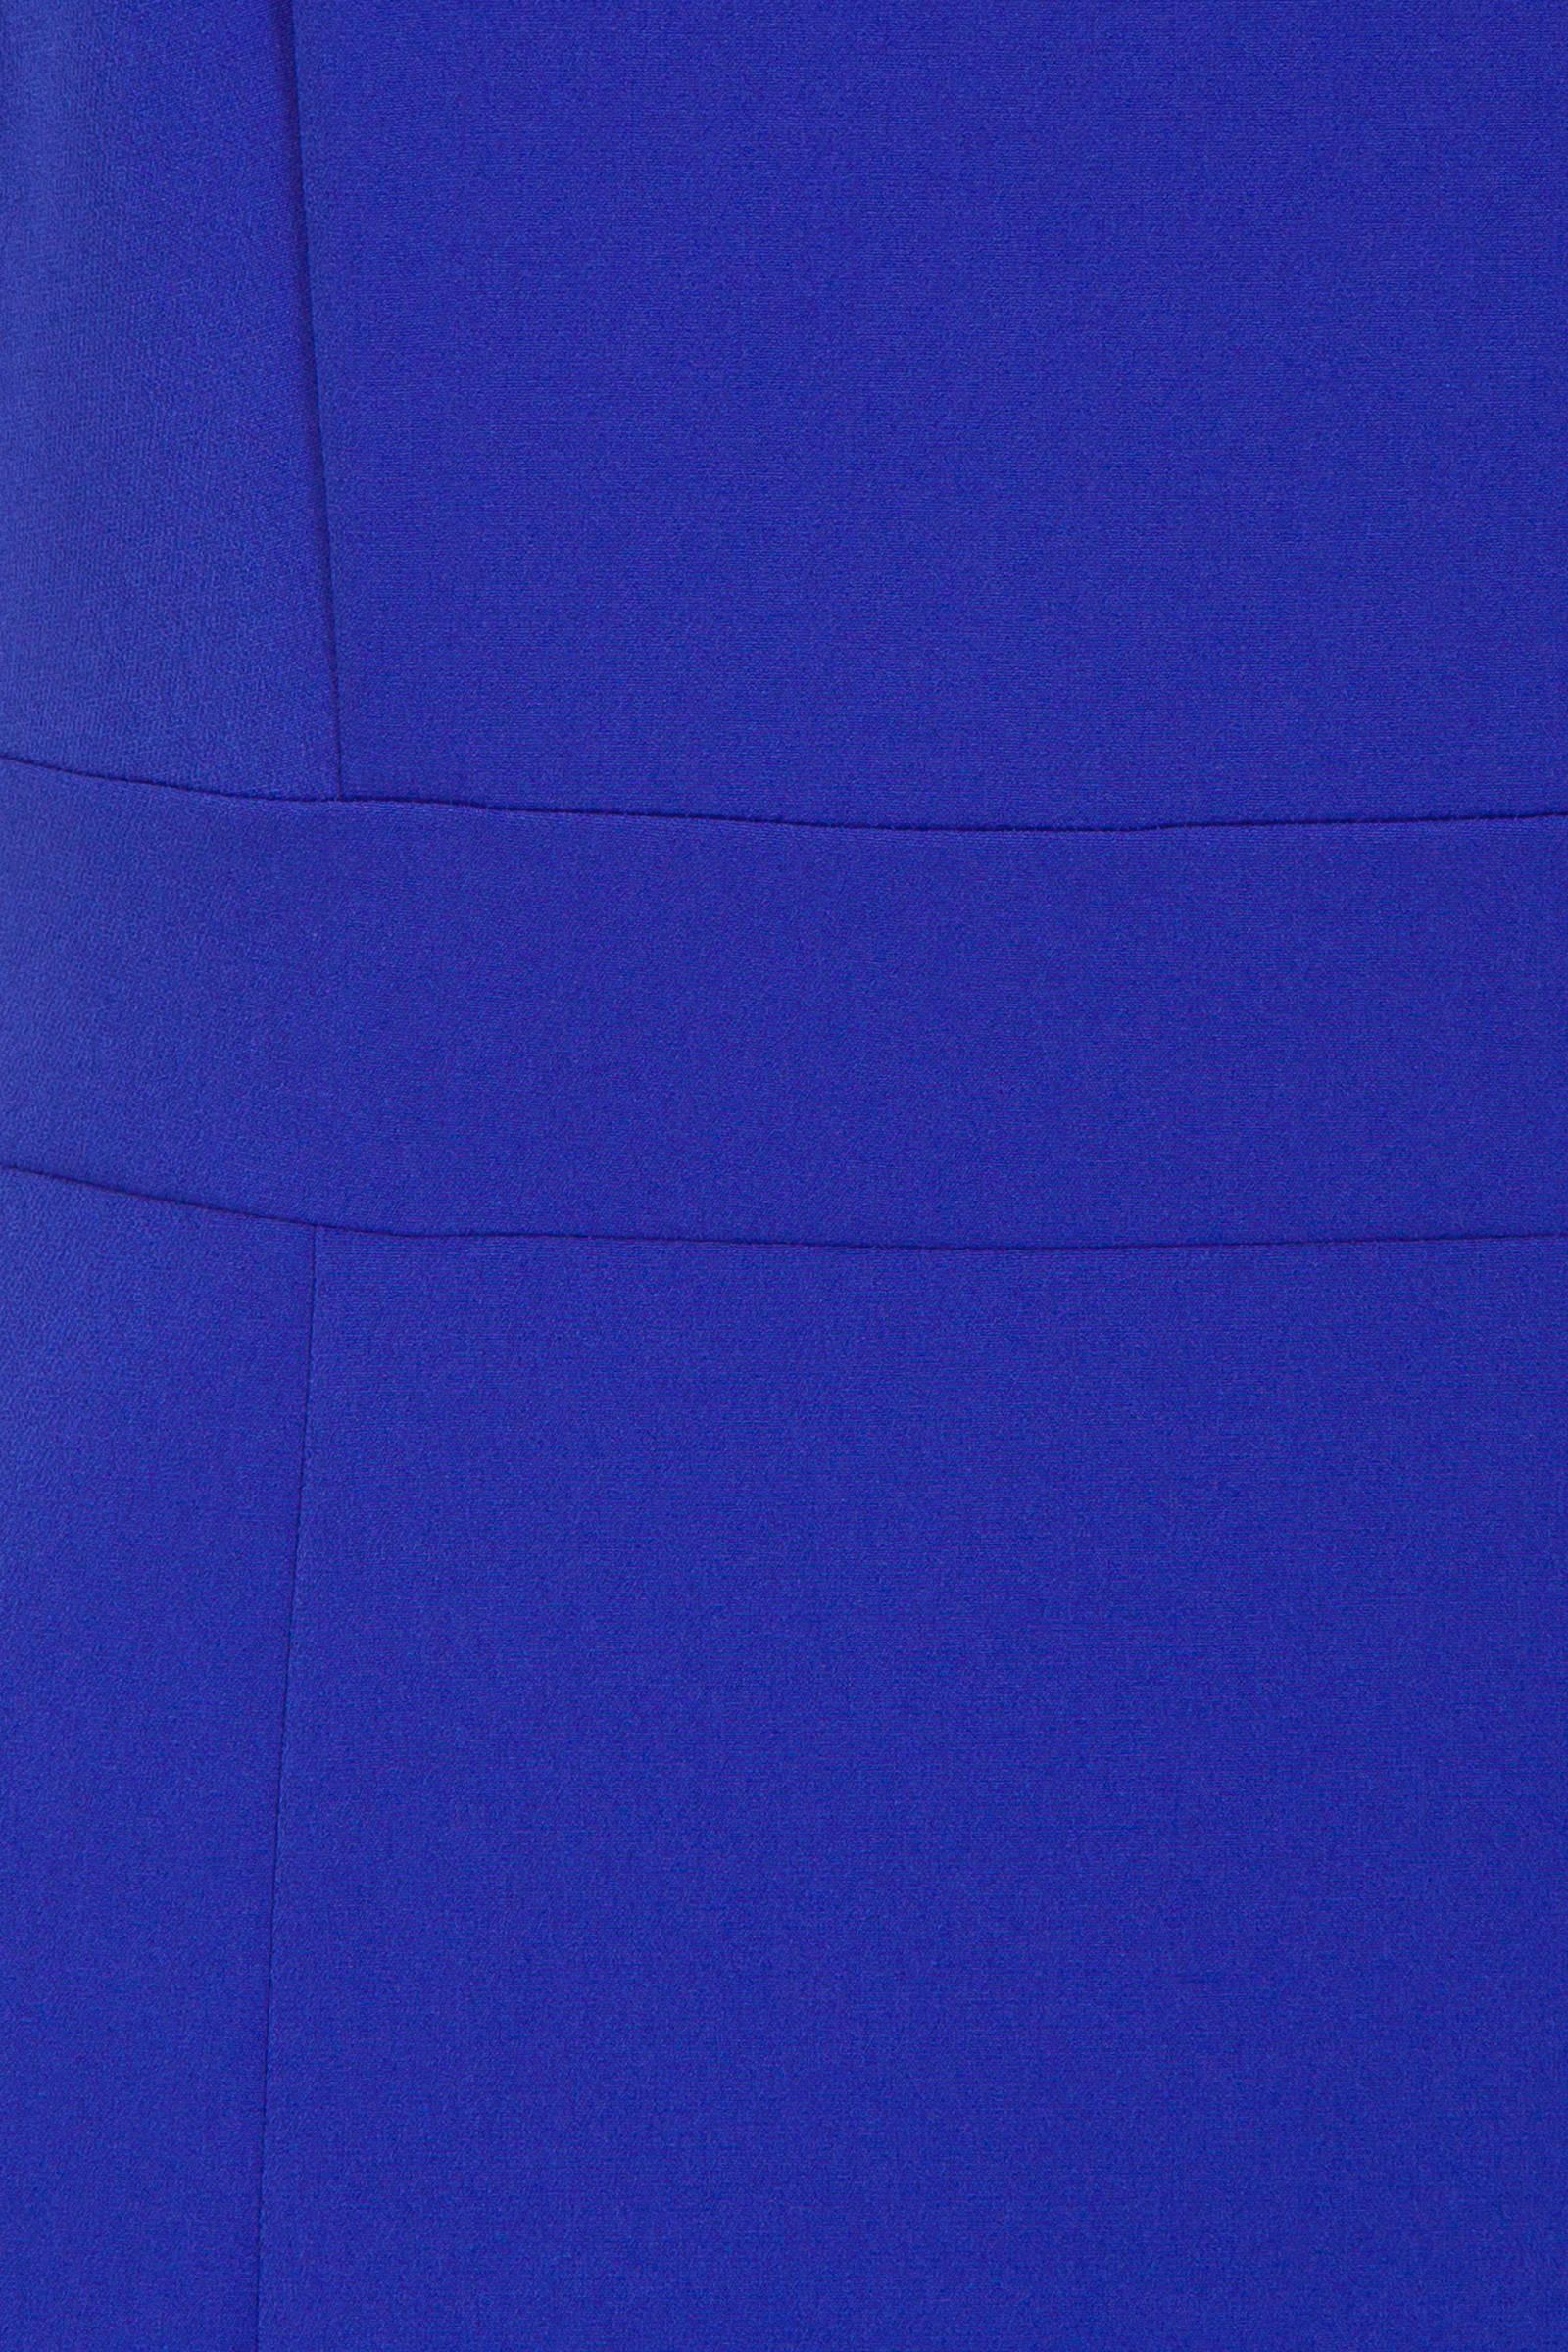 Steps Steps jurk jurk blauw jurk blauw Steps blauw Steps WBwqpBRUY